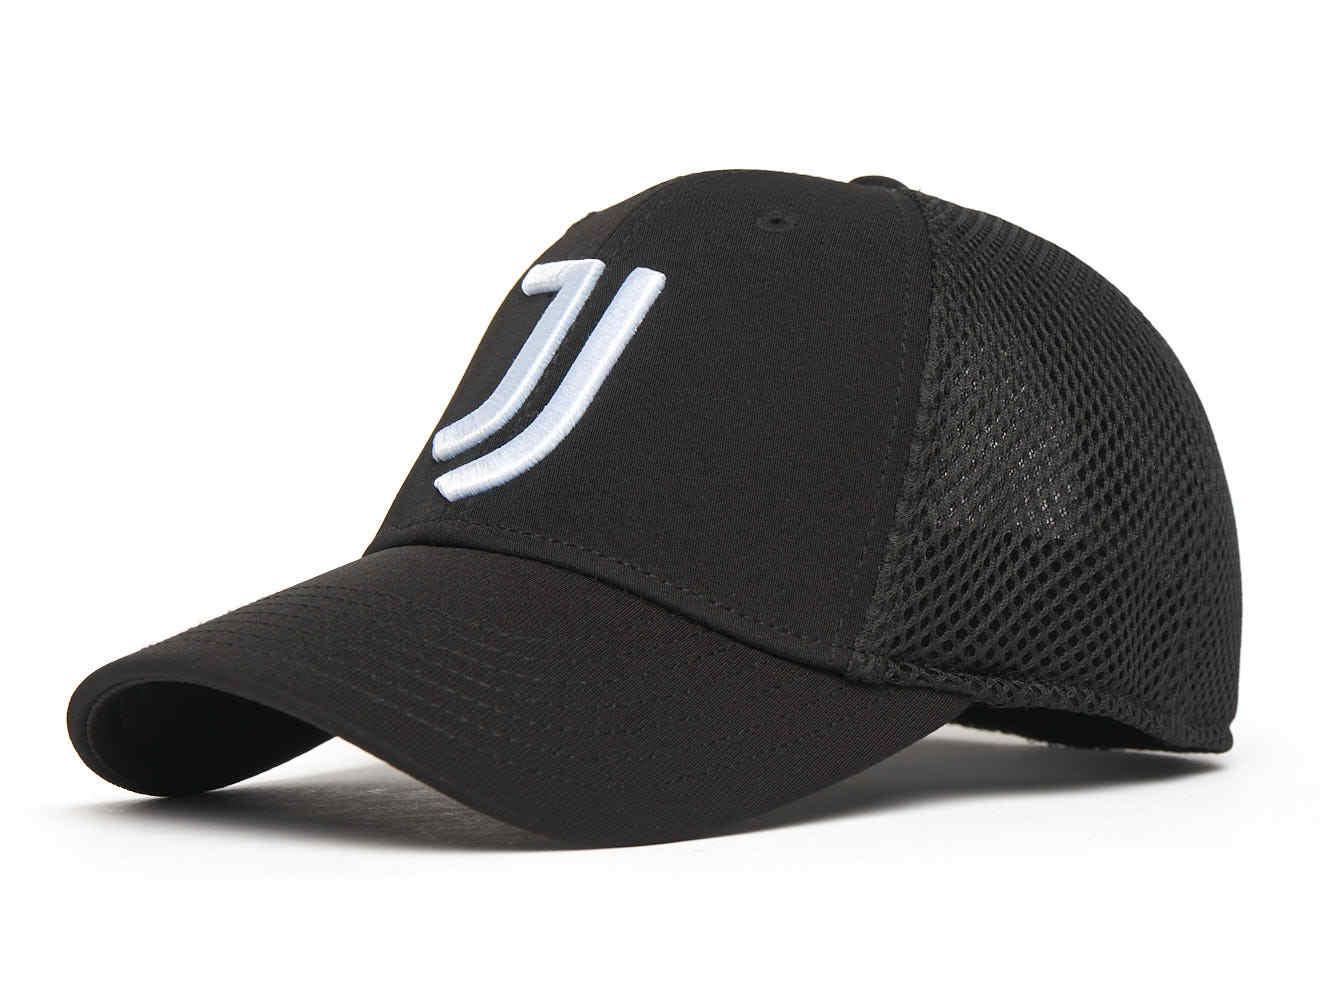 Бейсболка Ювентус (размер S)